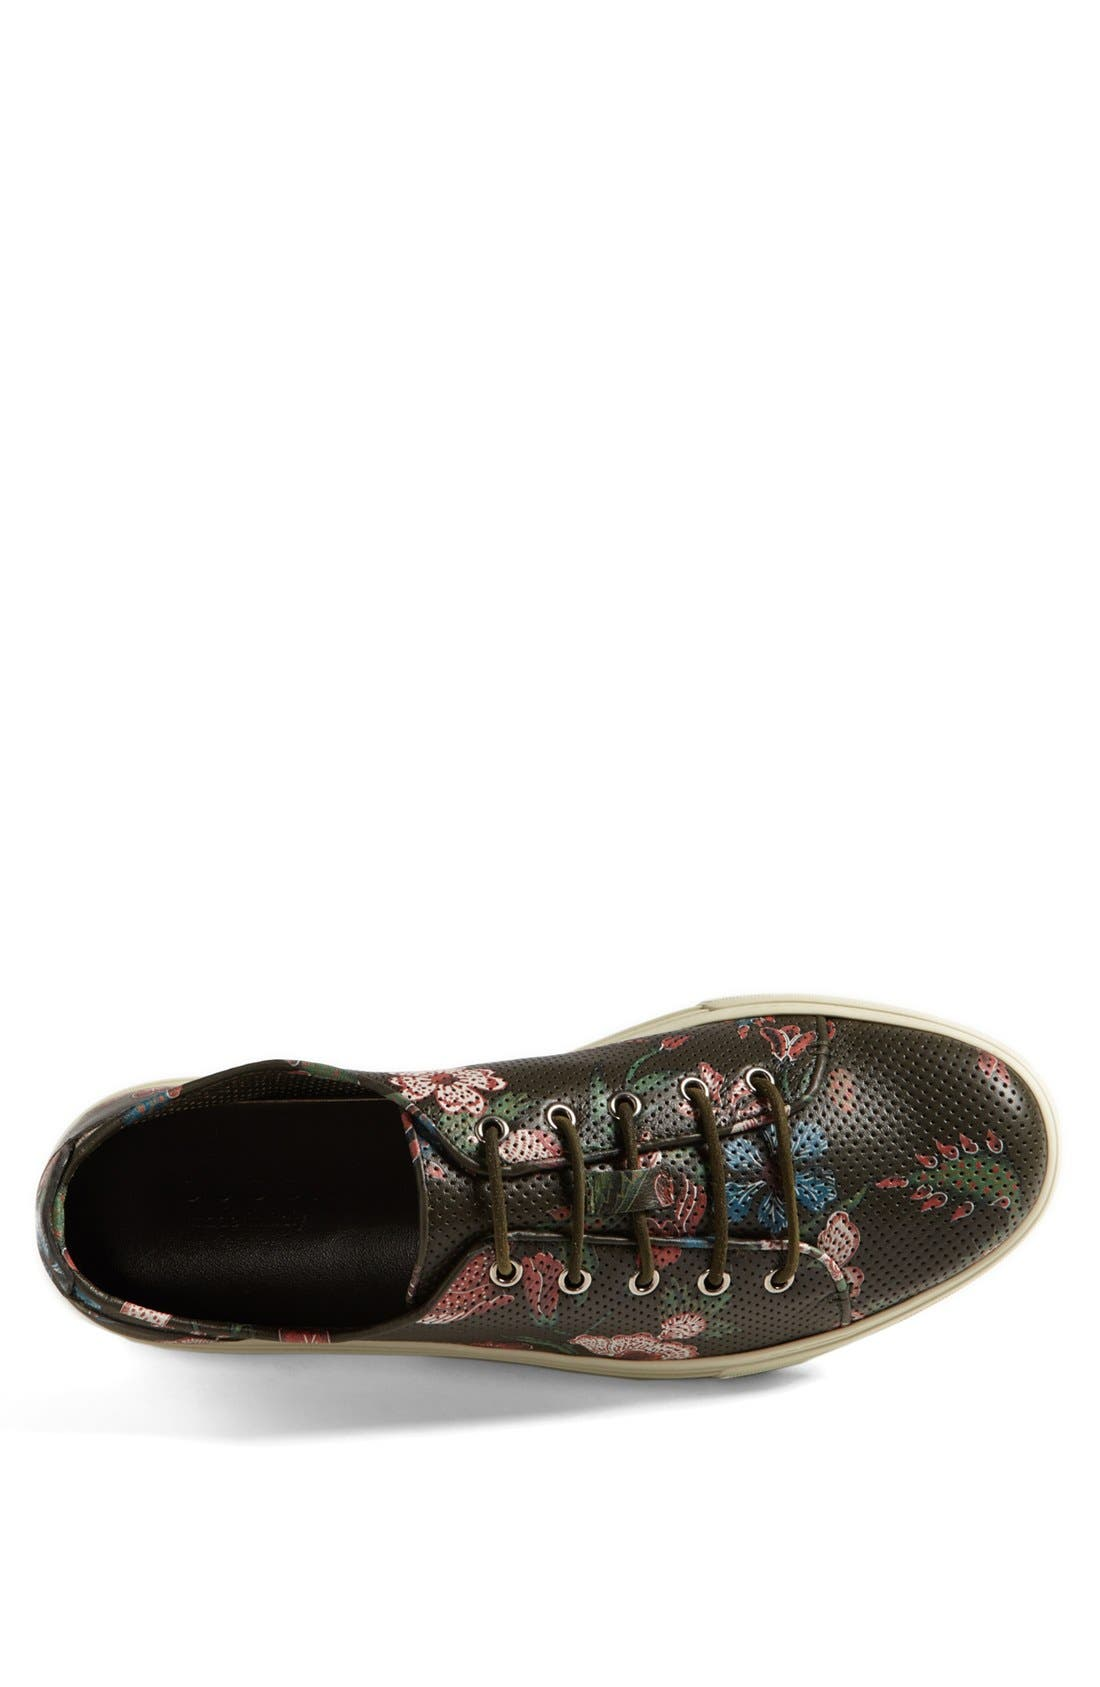 Alternate Image 3  - Gucci 'Jimy' Print Low Sneaker